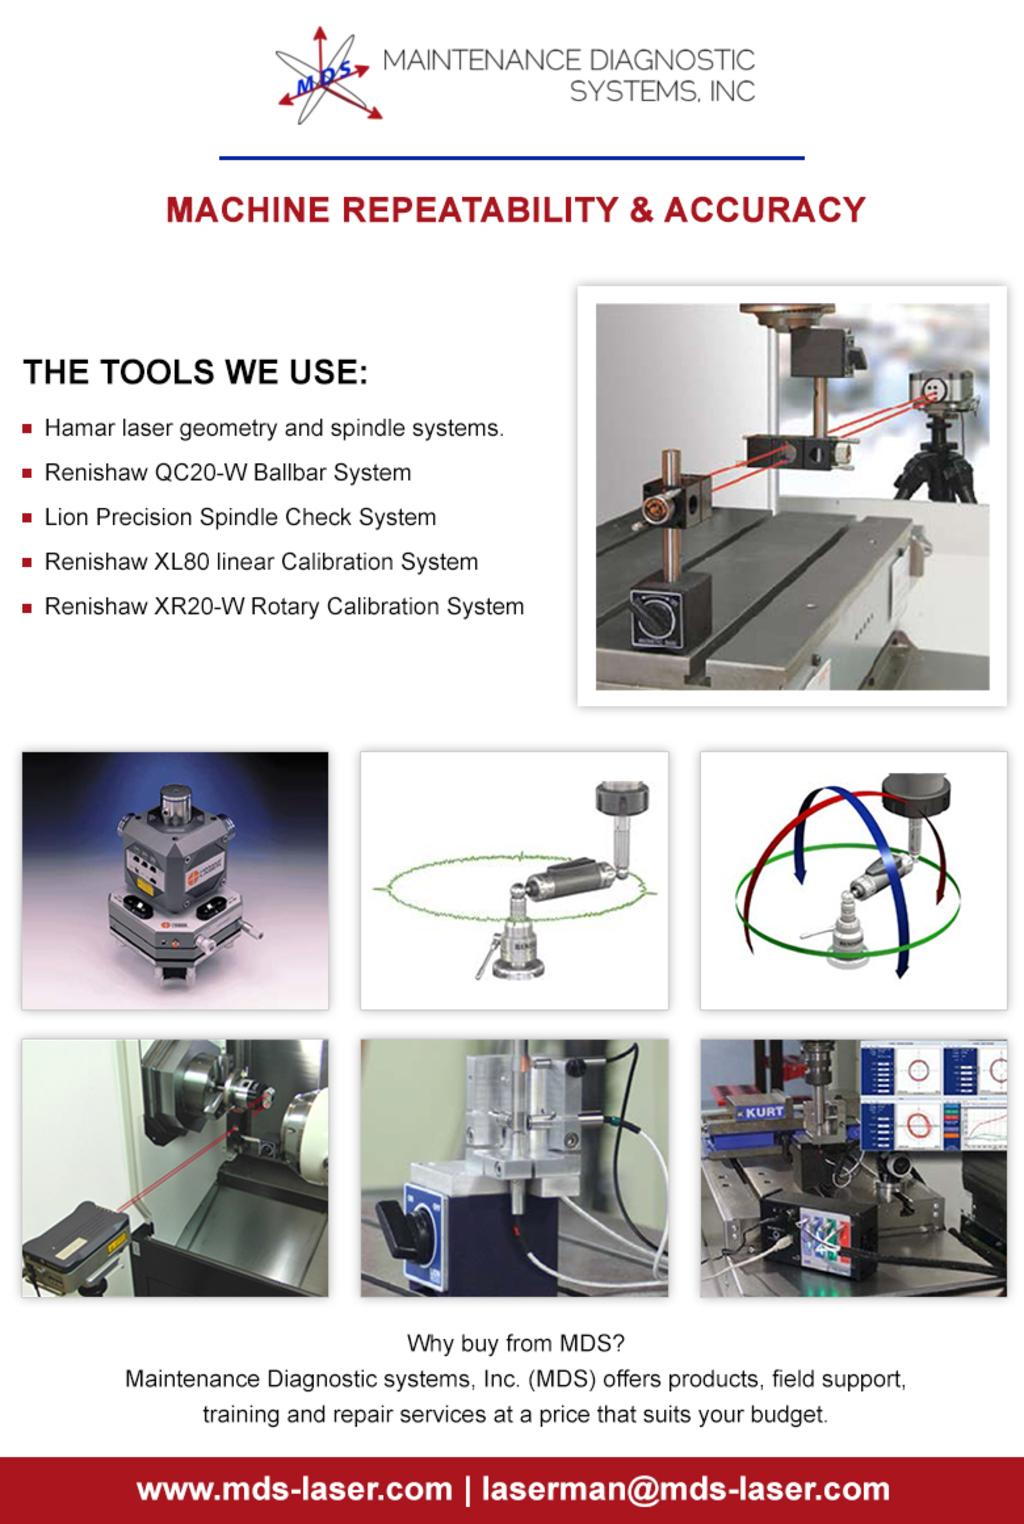 Maintenance Diagnostic Systems Inc, offers products field su... via sainothan james